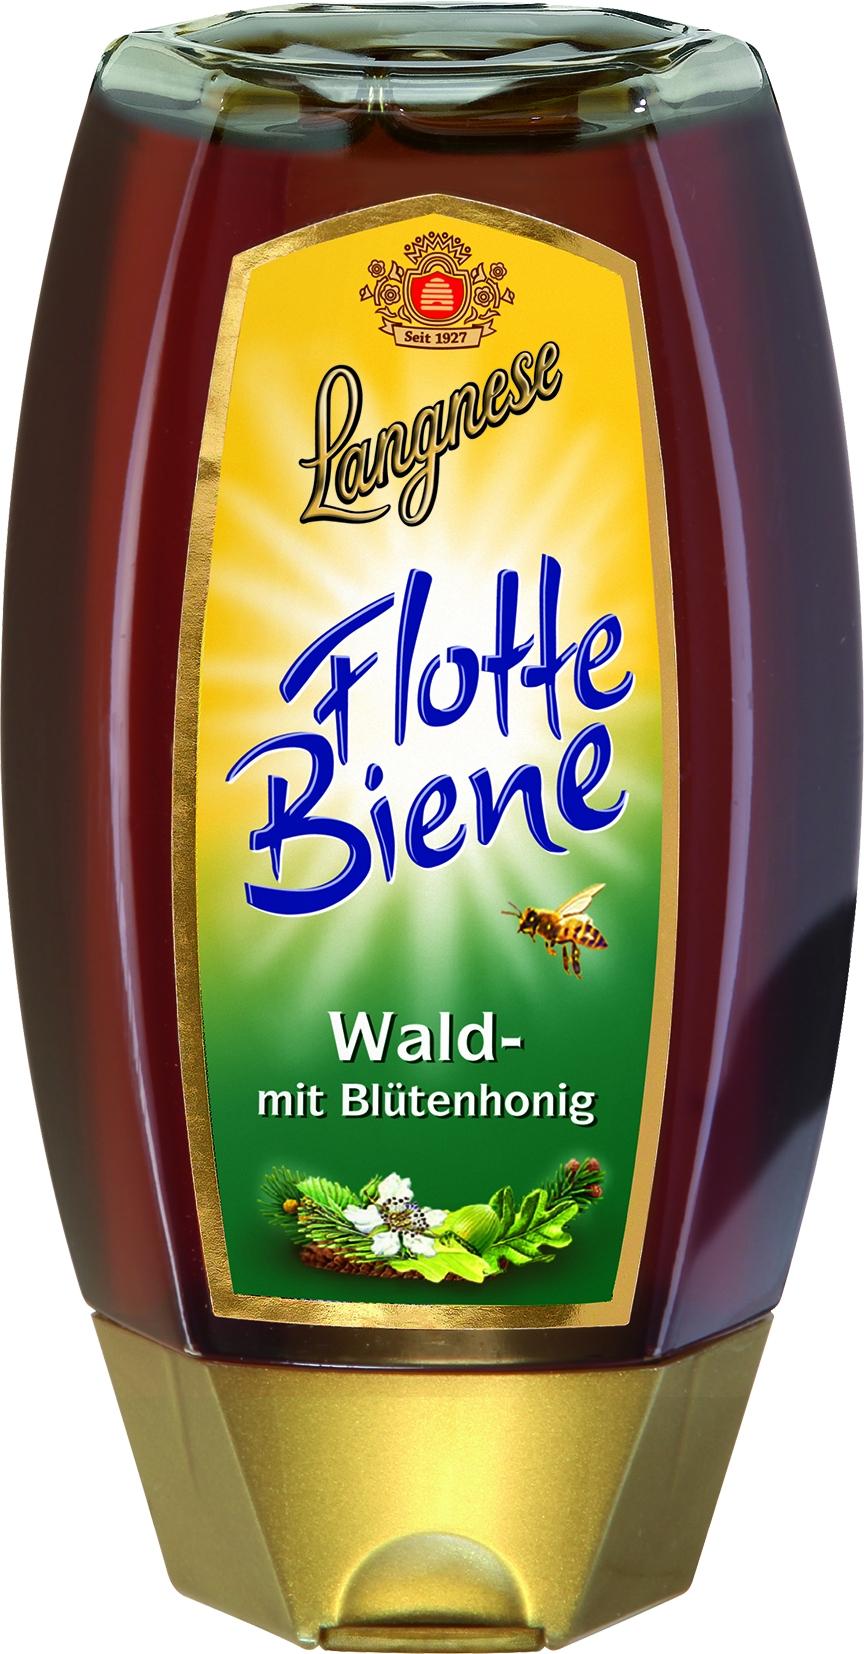 Flotte Biene Waldhonig